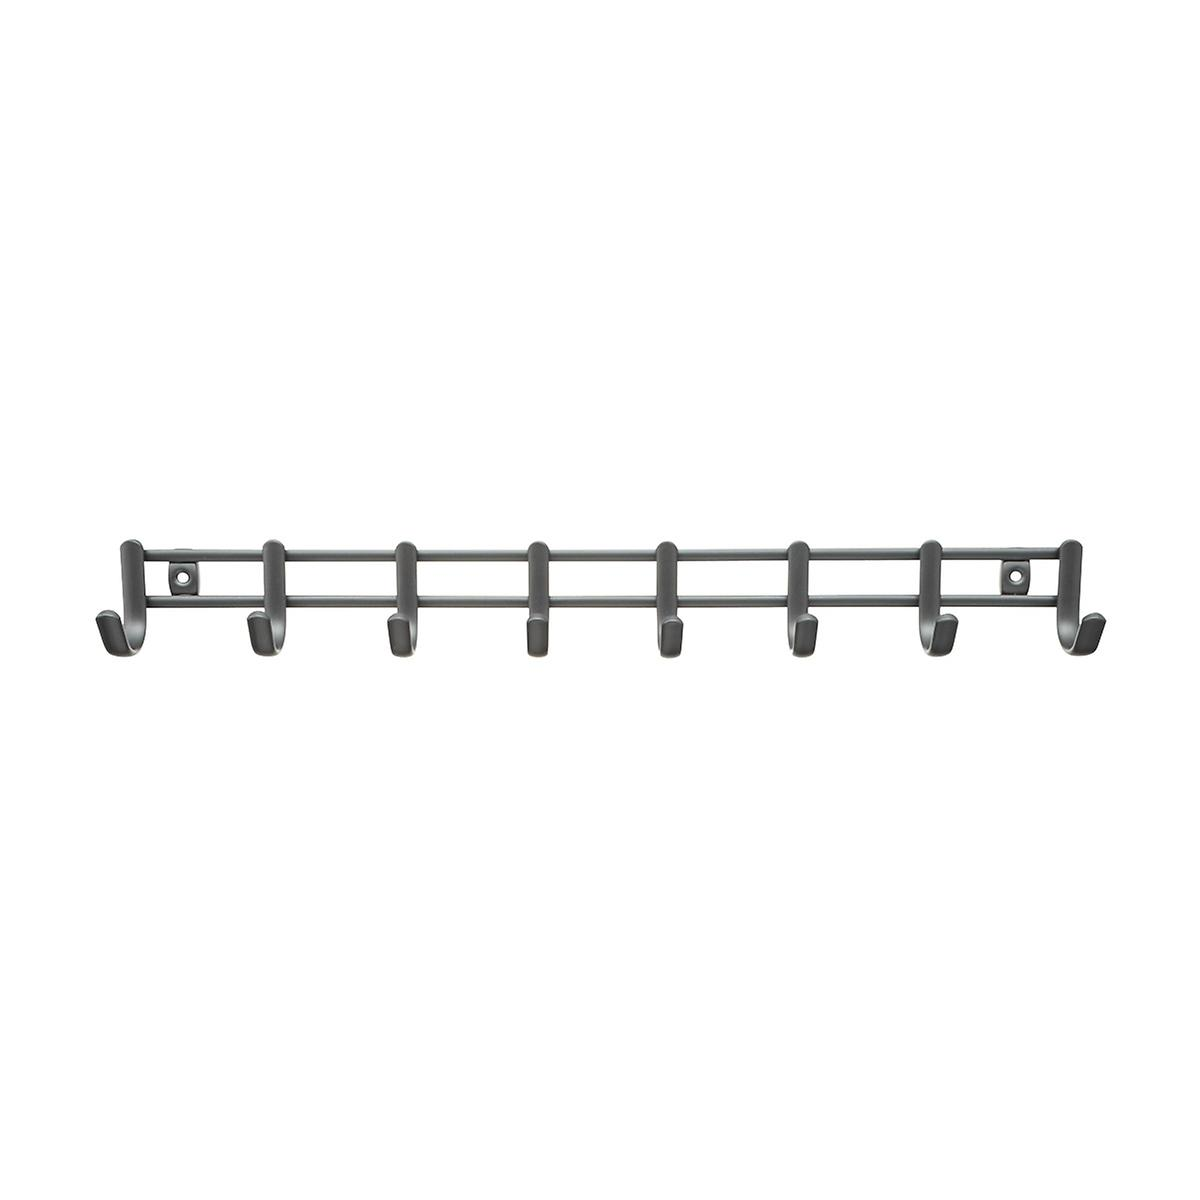 Idesign Axis Graphite Horizontal Tie Belt Rack